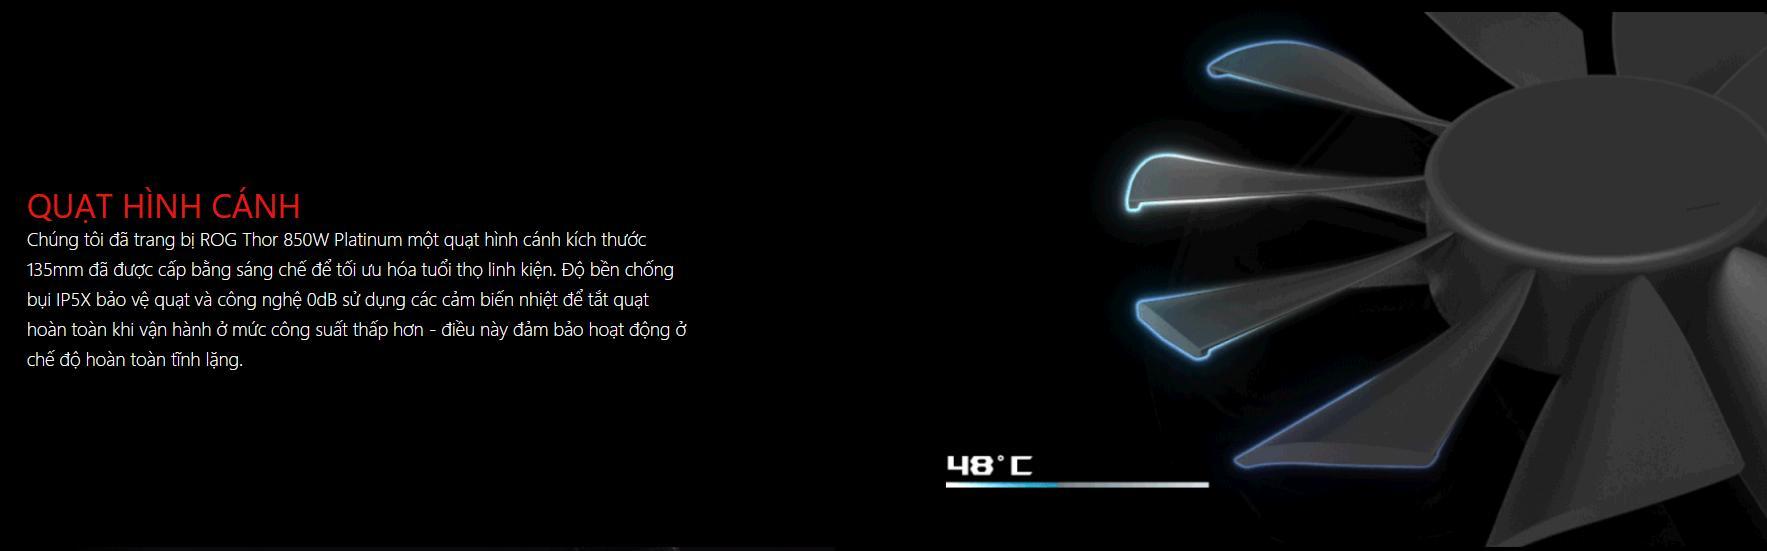 Nguồn Asus ROG Thor 850W Platinum - RGB 850W 80 Plus Platinum Full Modular quạt tản nhiệt